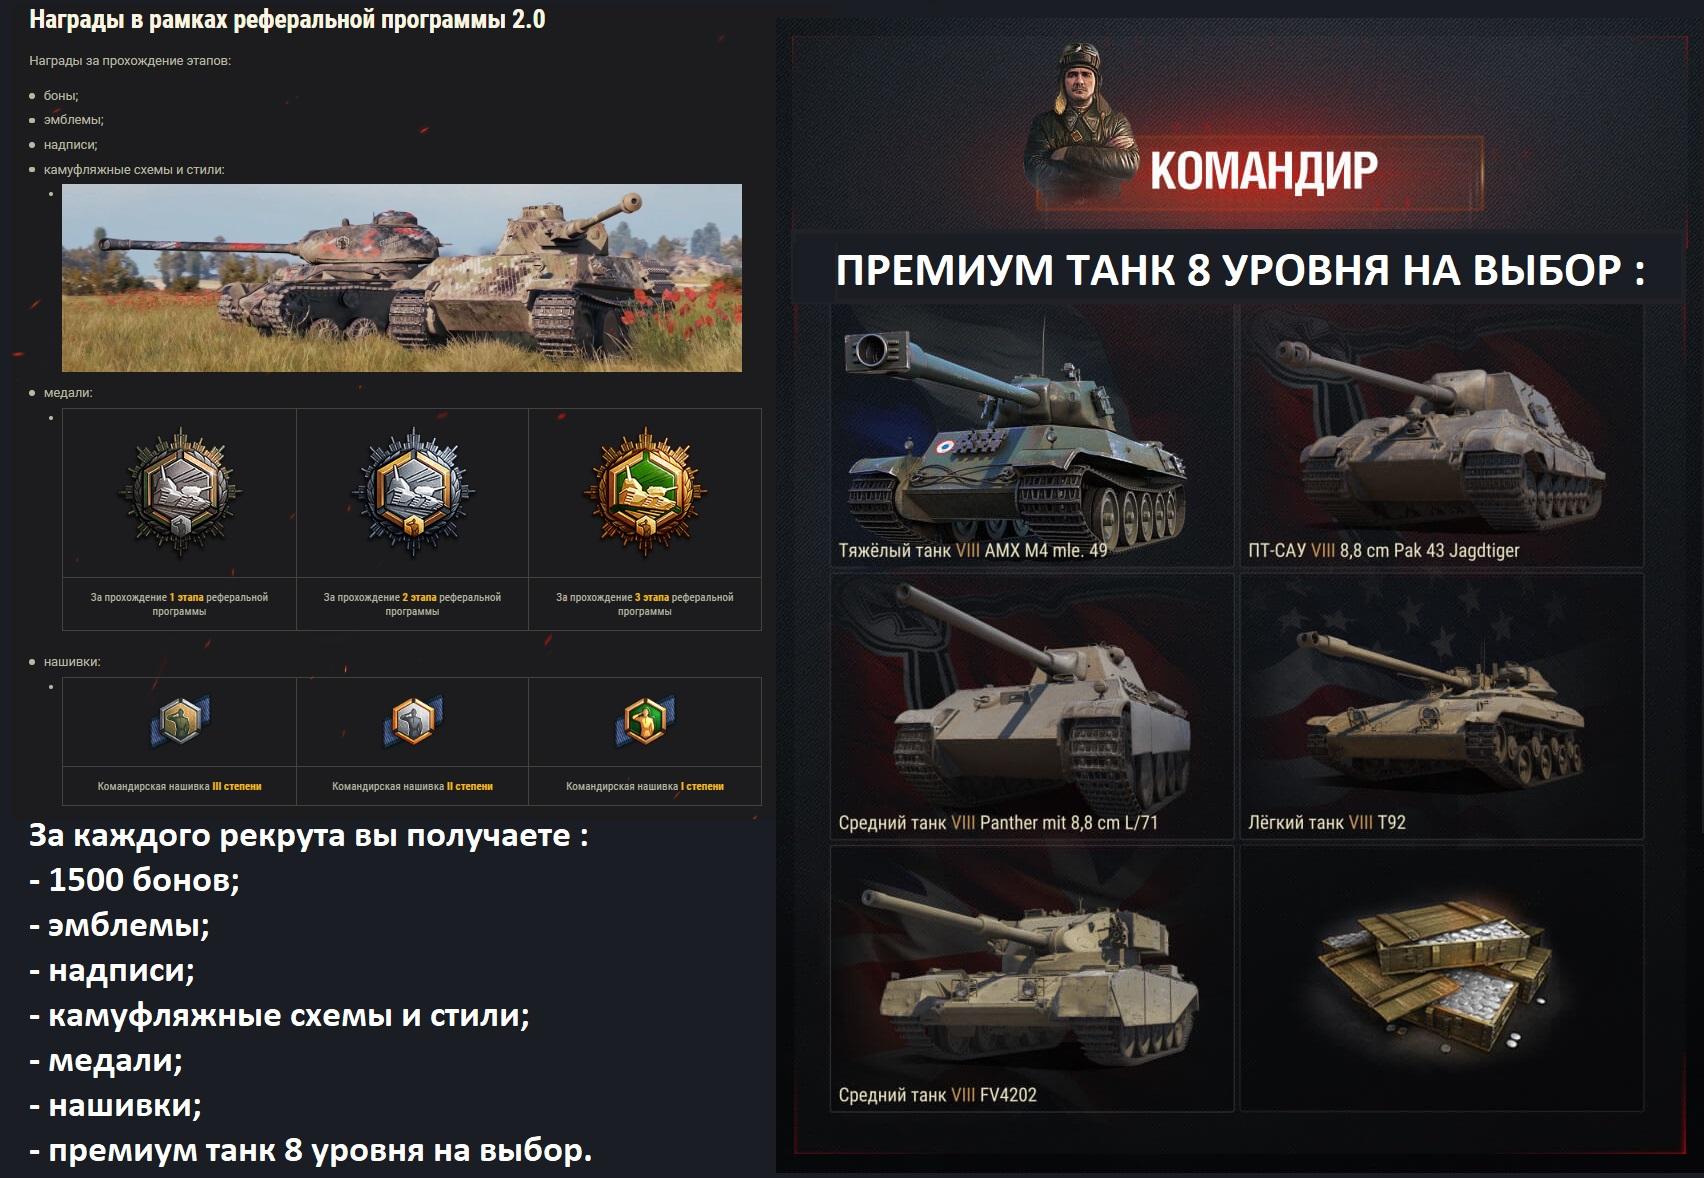 ✅Referral program 2 0 Premium tank tier 8 + 1500 bonds